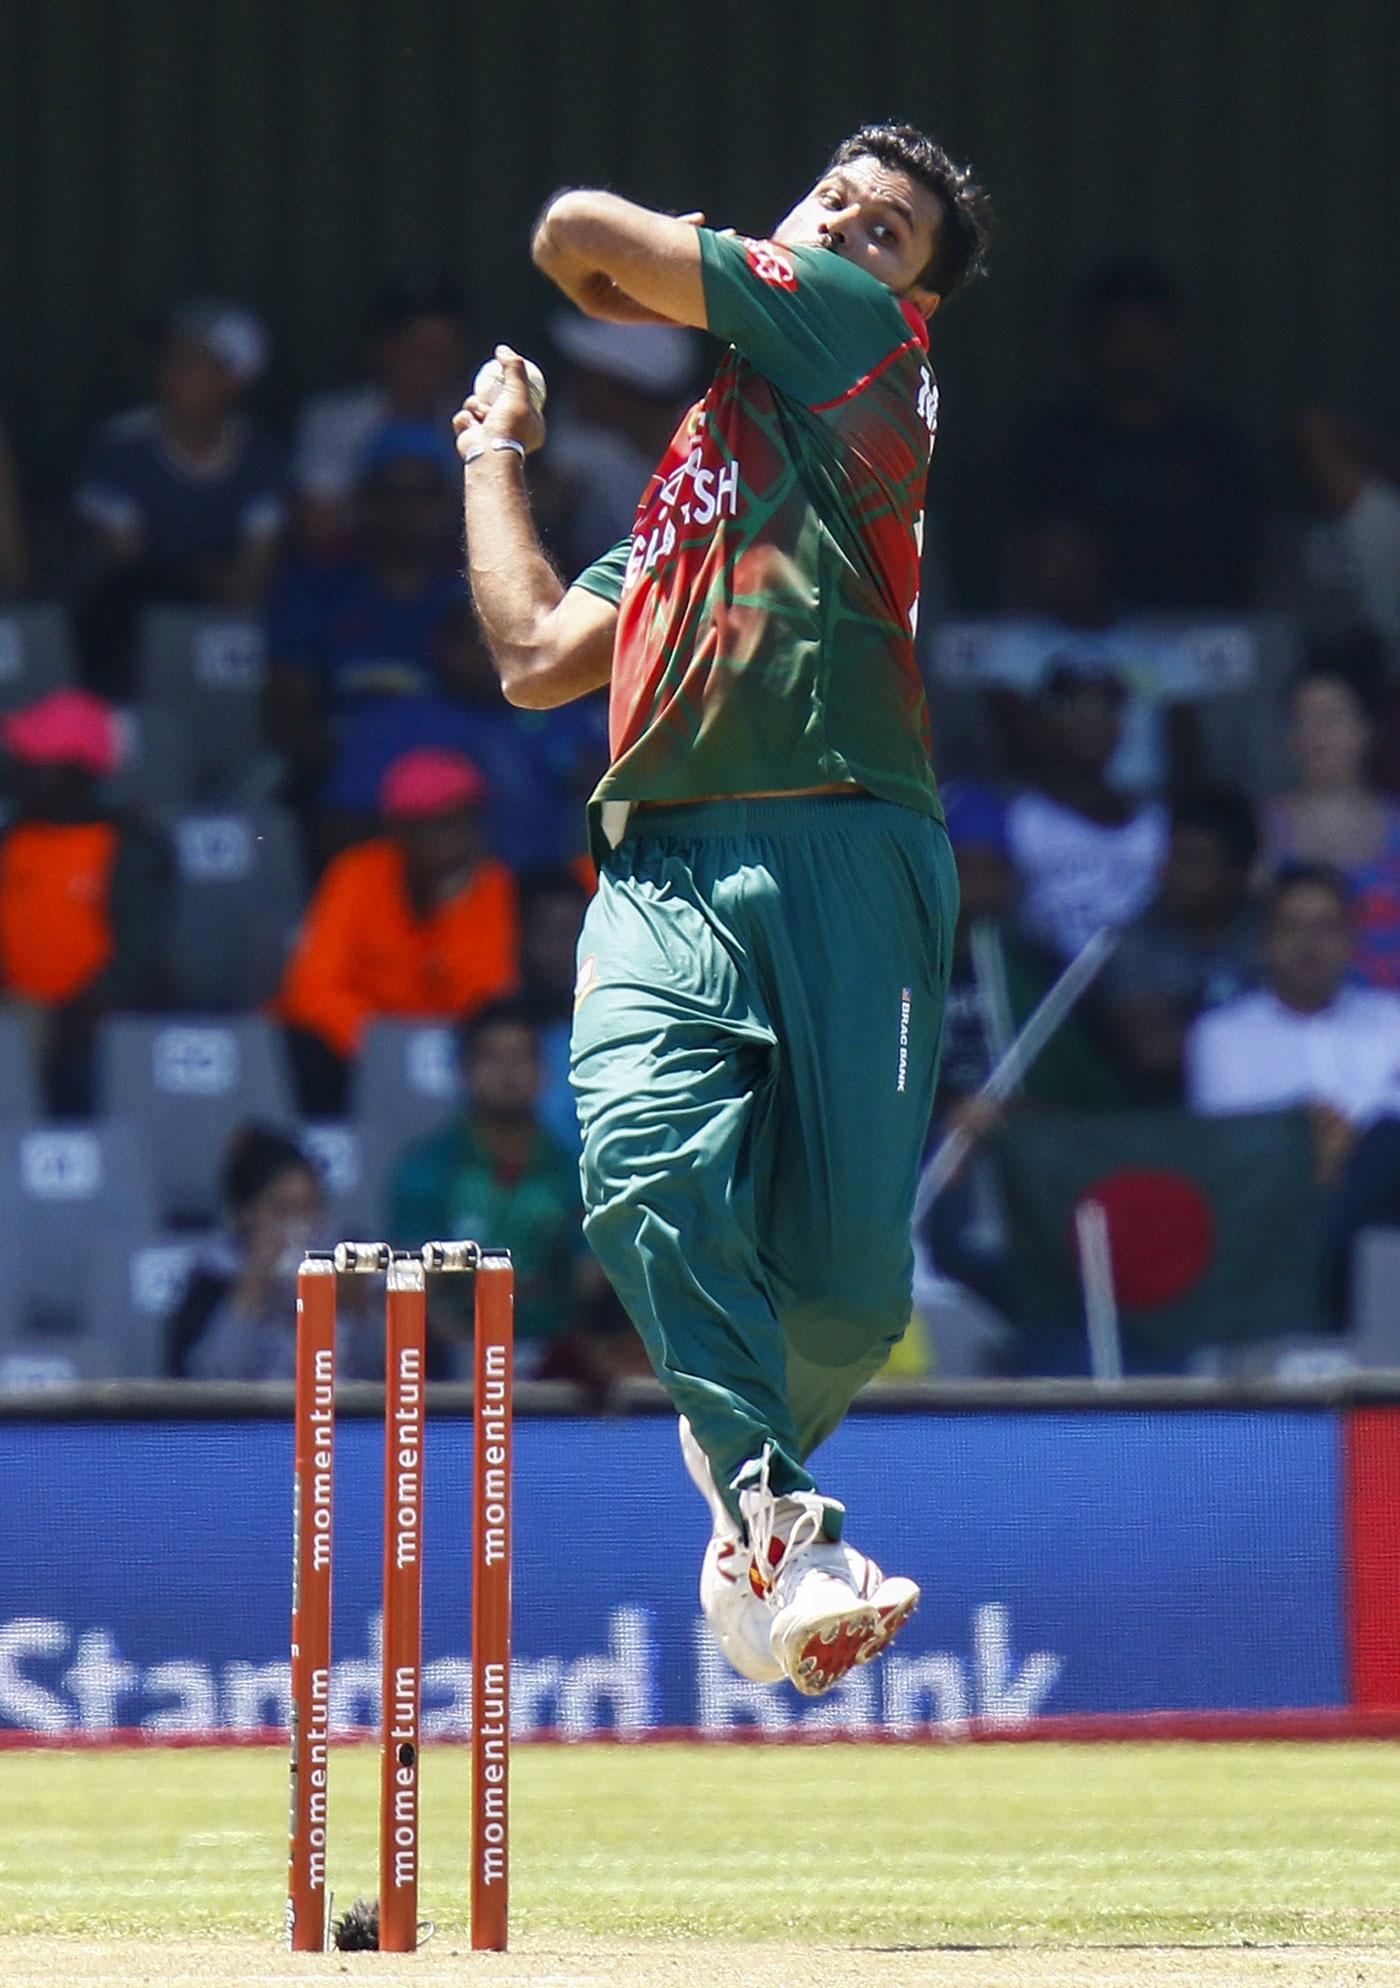 SA vs BAN 2017: Bangladesh Cricket Board to Investigate Three Players for Breaking Team Protocol 9